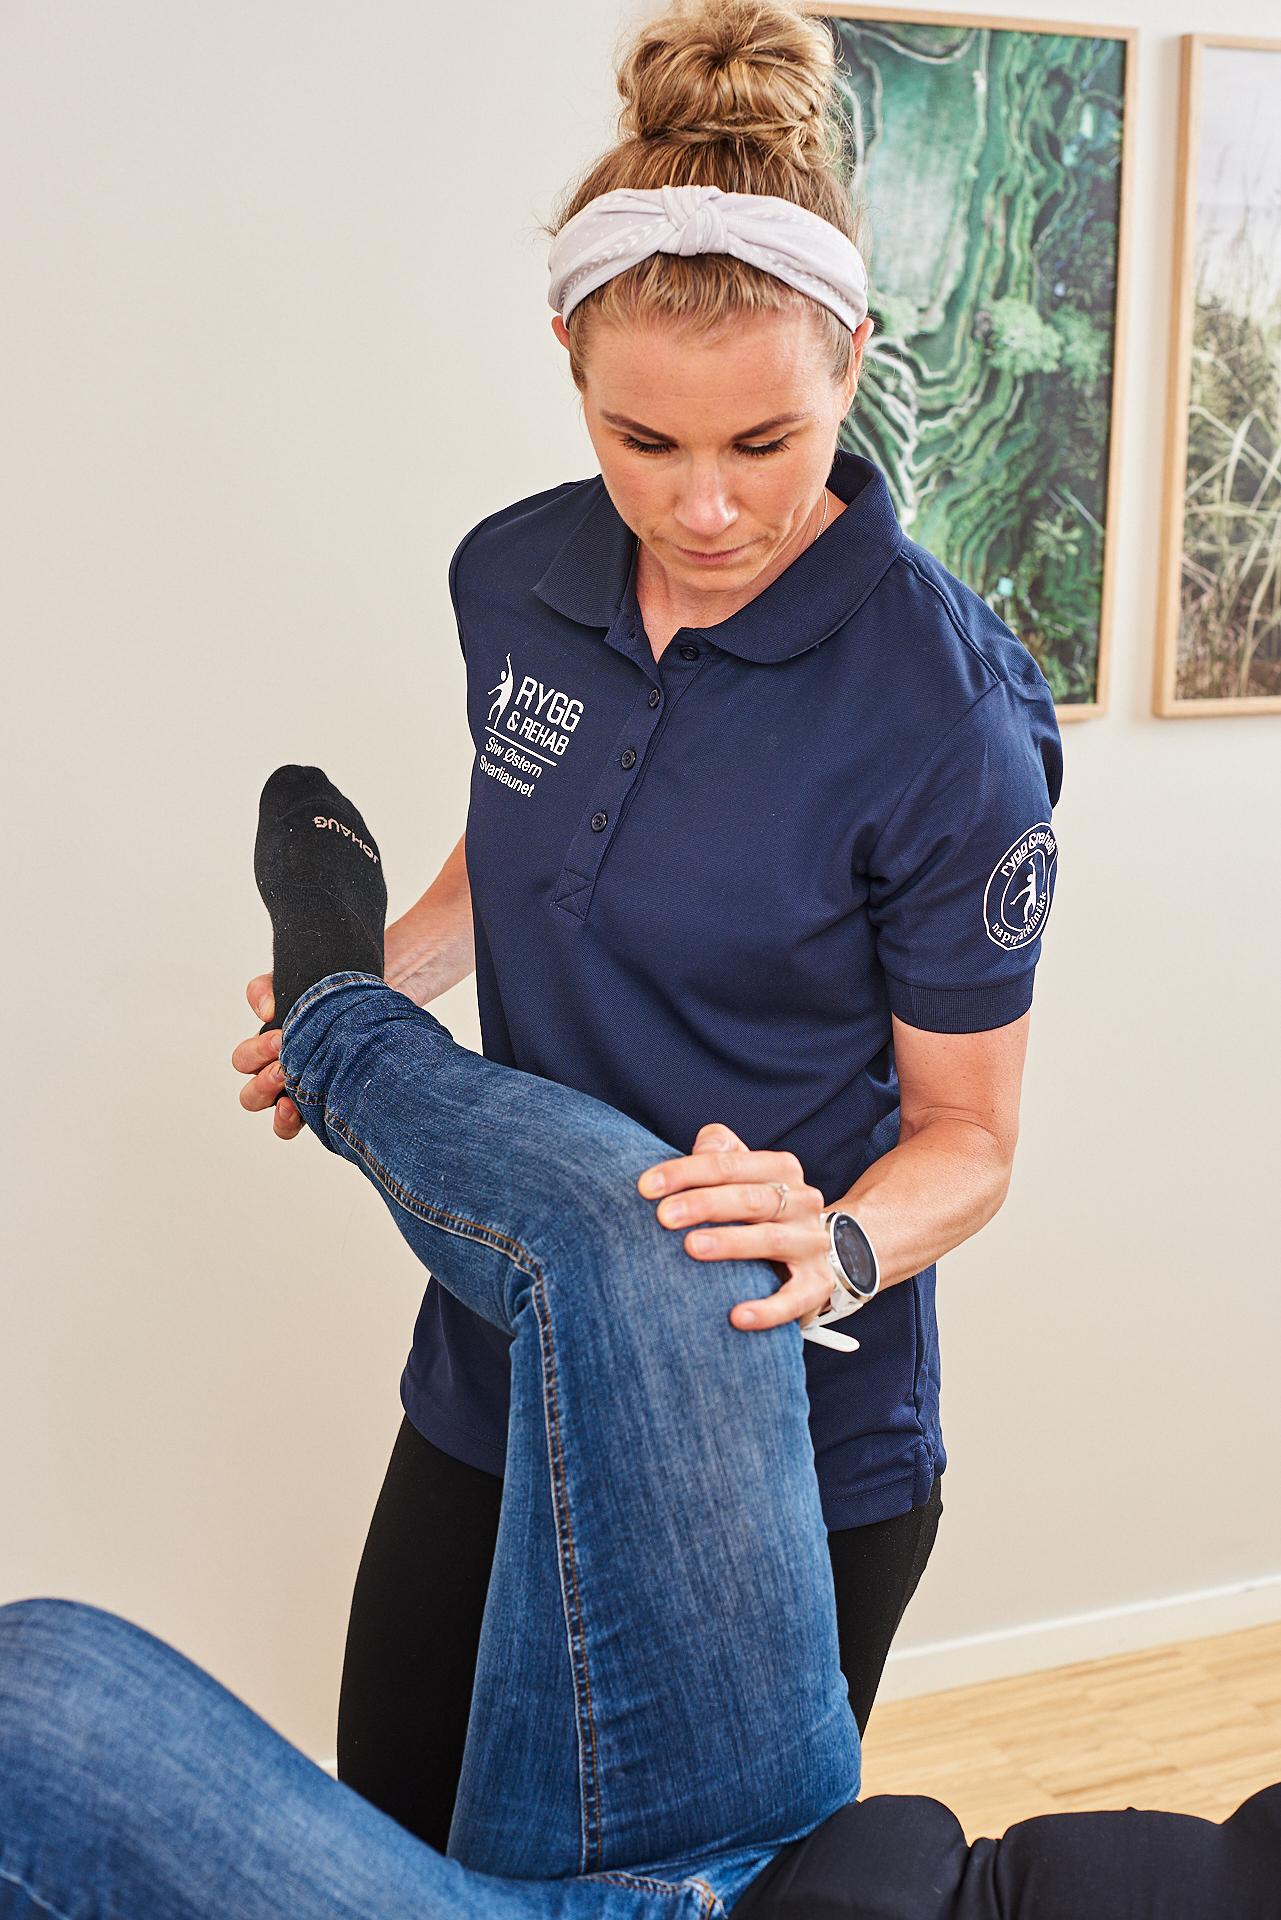 Behandling knesmerter kiropraktor